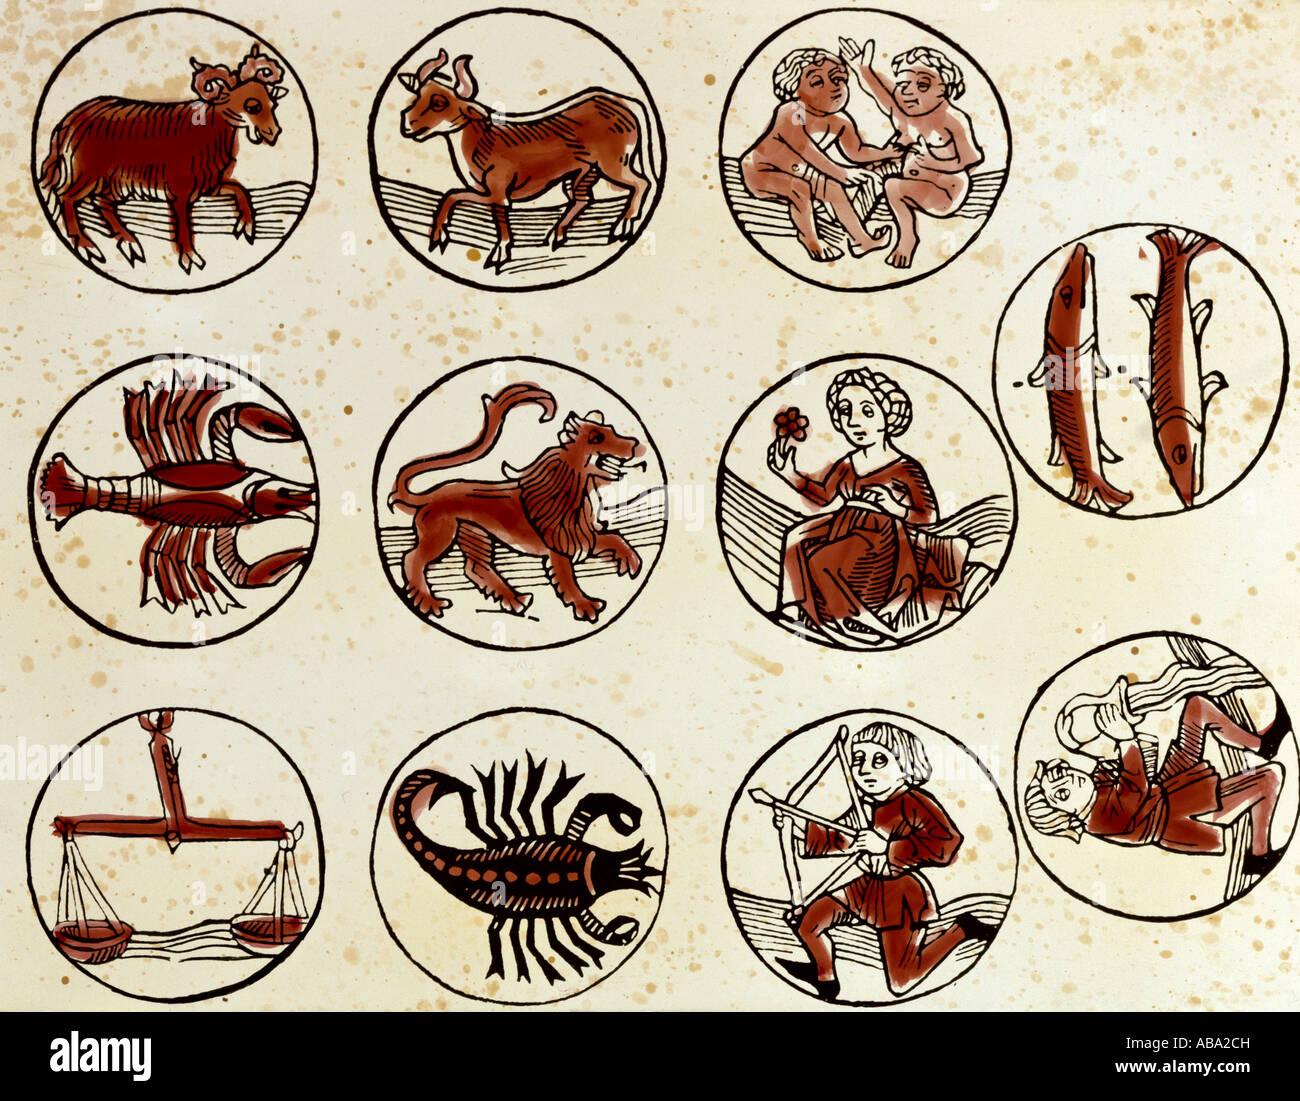 astrology, zodiac signs, coloured woodcut, 'Teutsch Kalender', printed by  H. Schäffler, Germany, 1498, - Stock Image